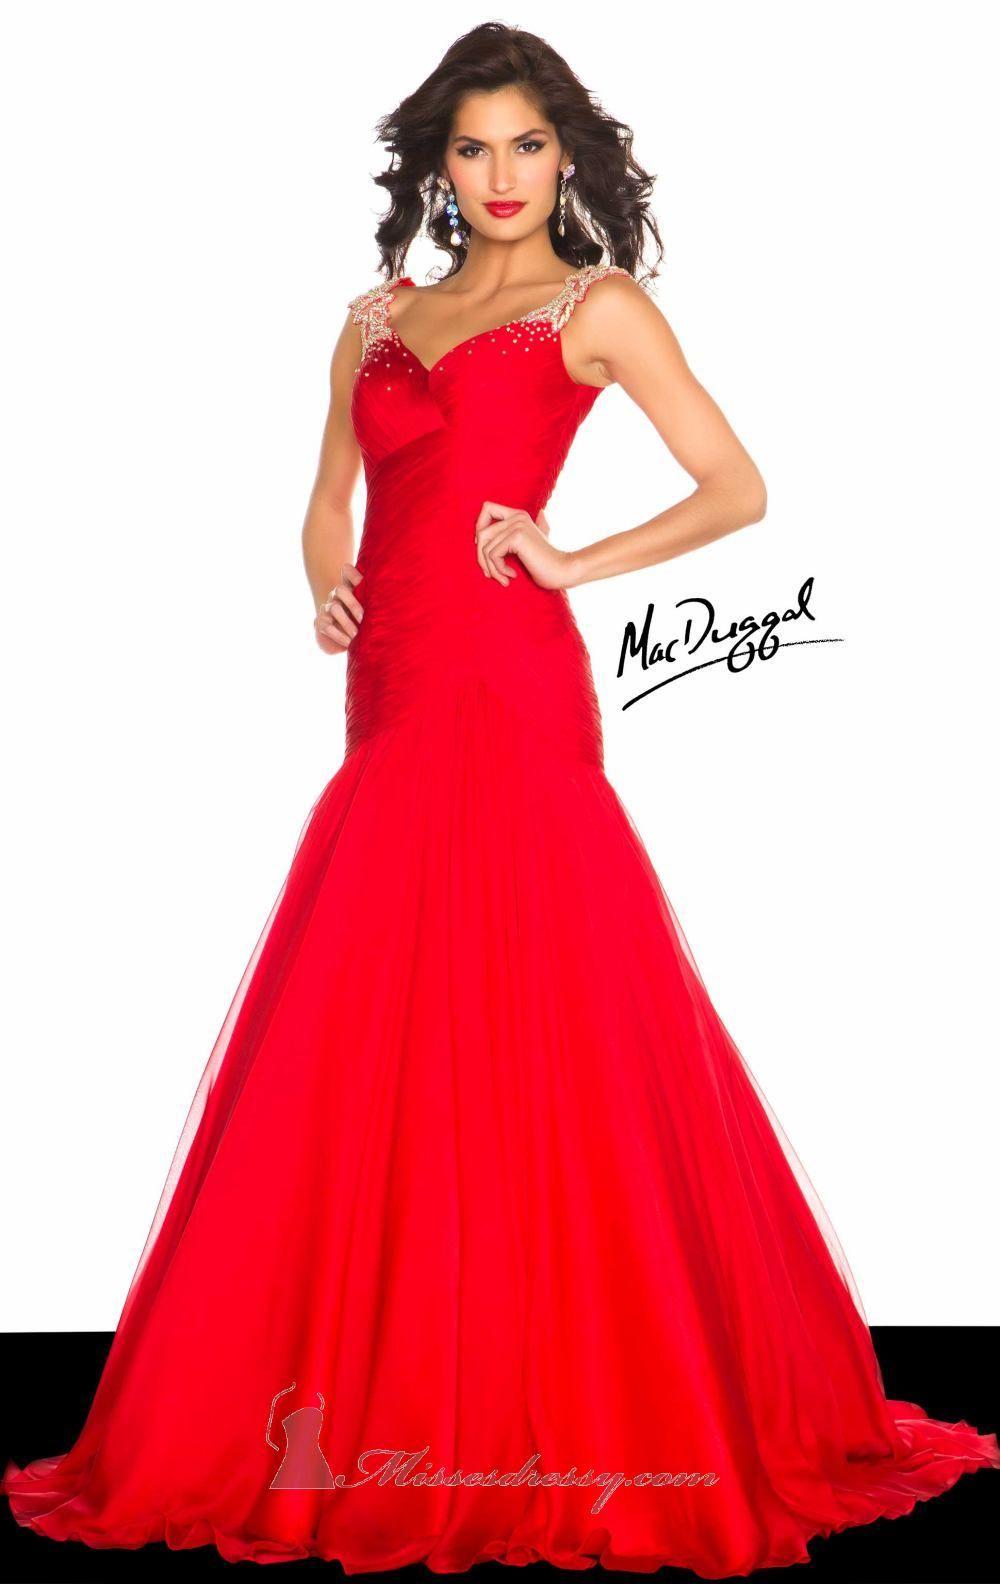 Macduggal off the shoulder mermaid dress r lovefashion